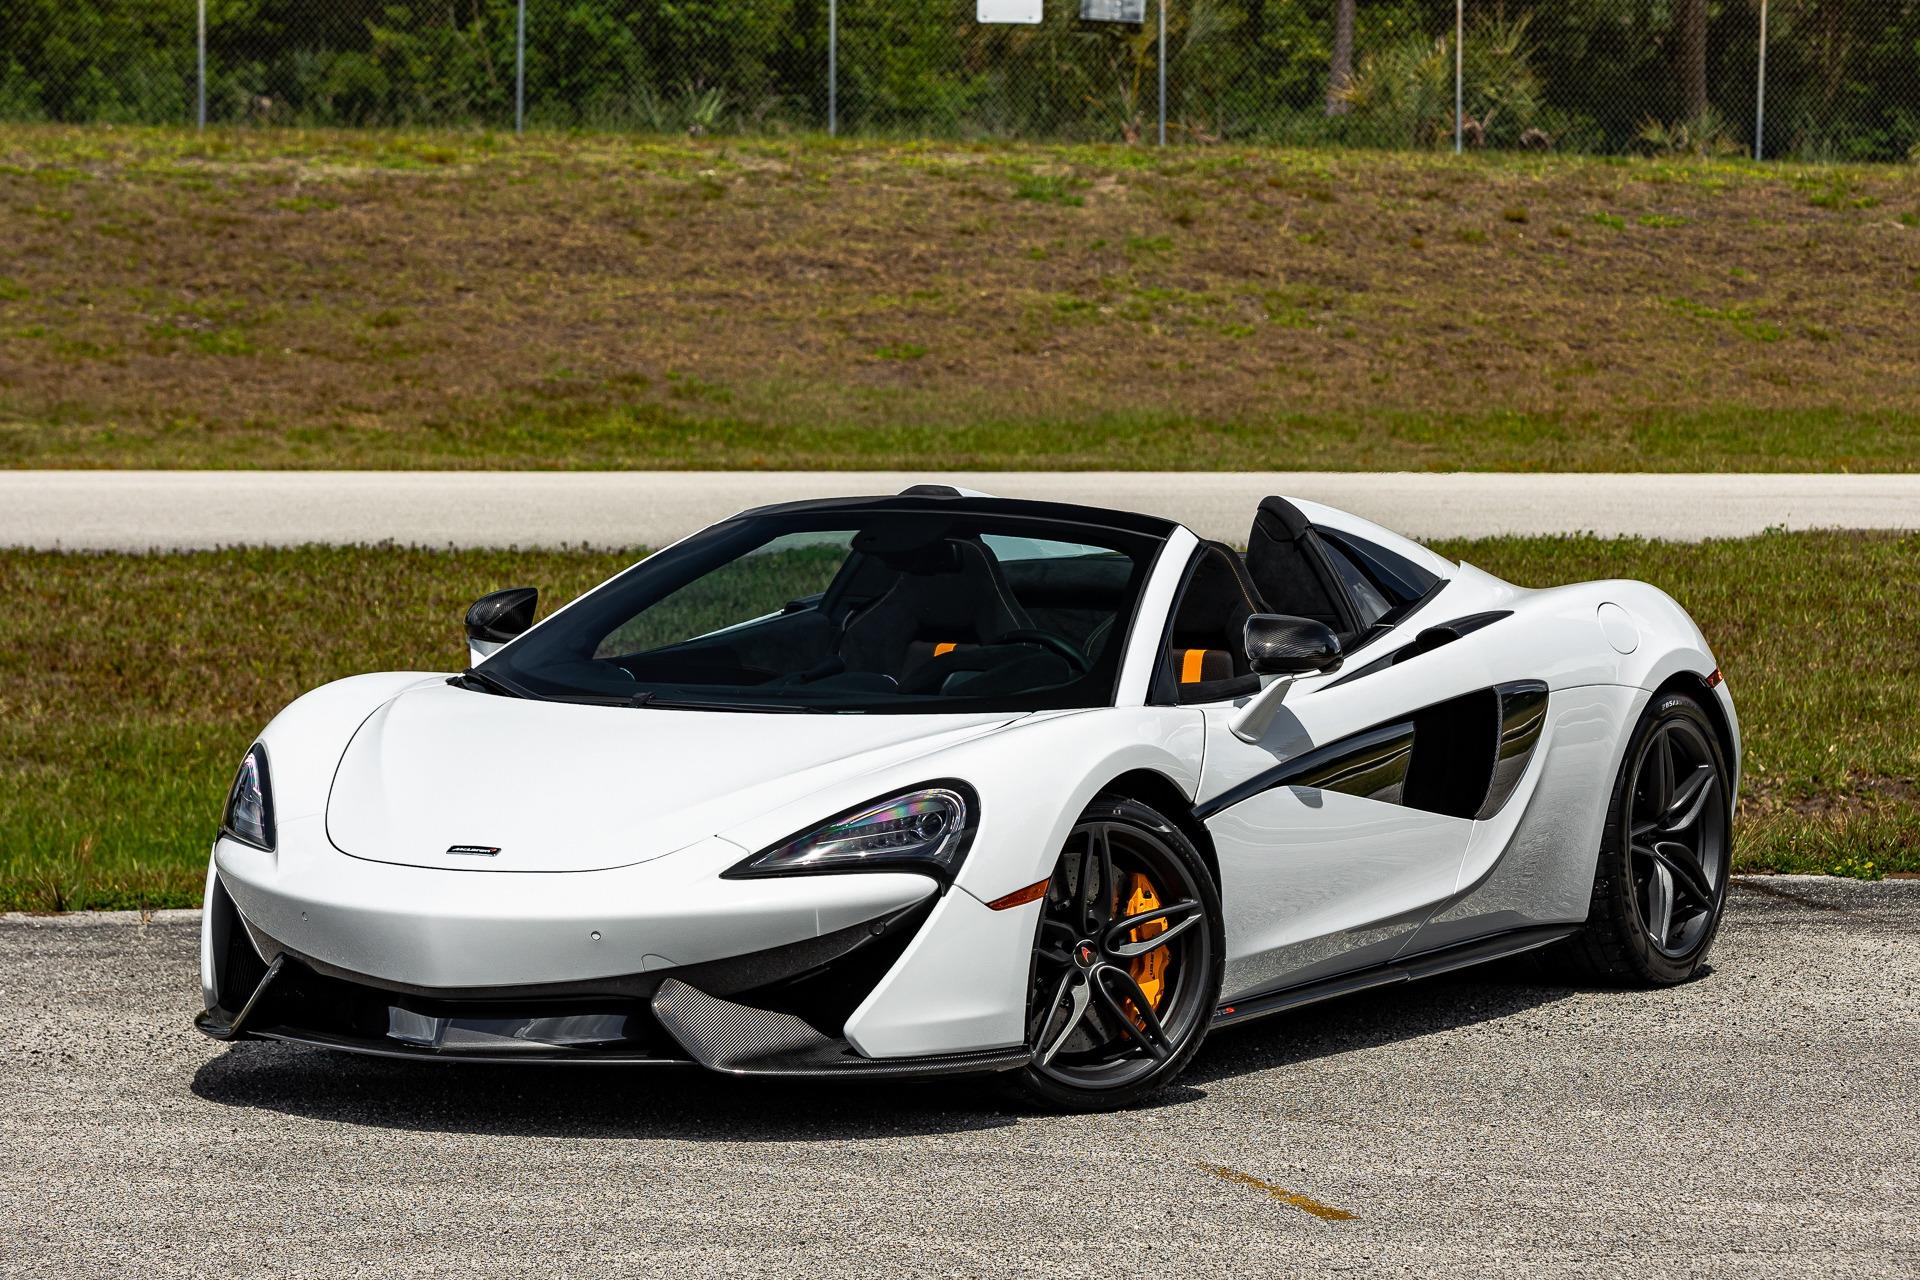 Used 2018 McLaren 570S Spider for sale $188,880 at McLaren Orlando LLC in Titusville FL 32780 1